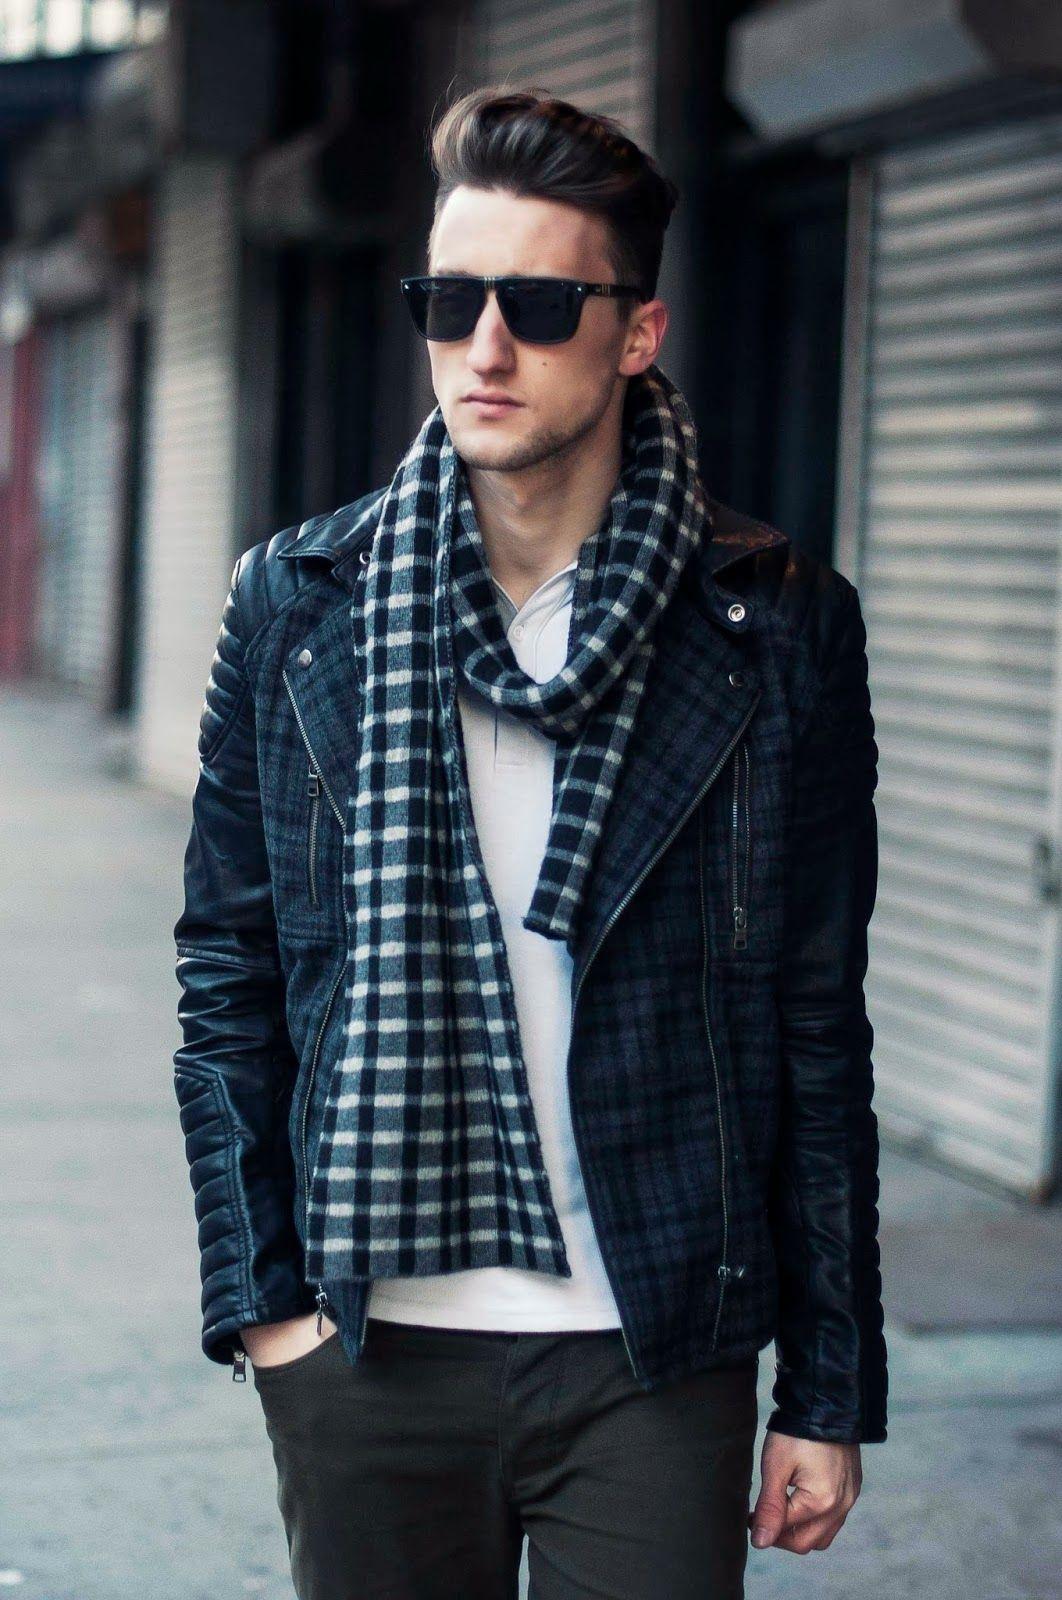 Look - Street men European fashion pictures video